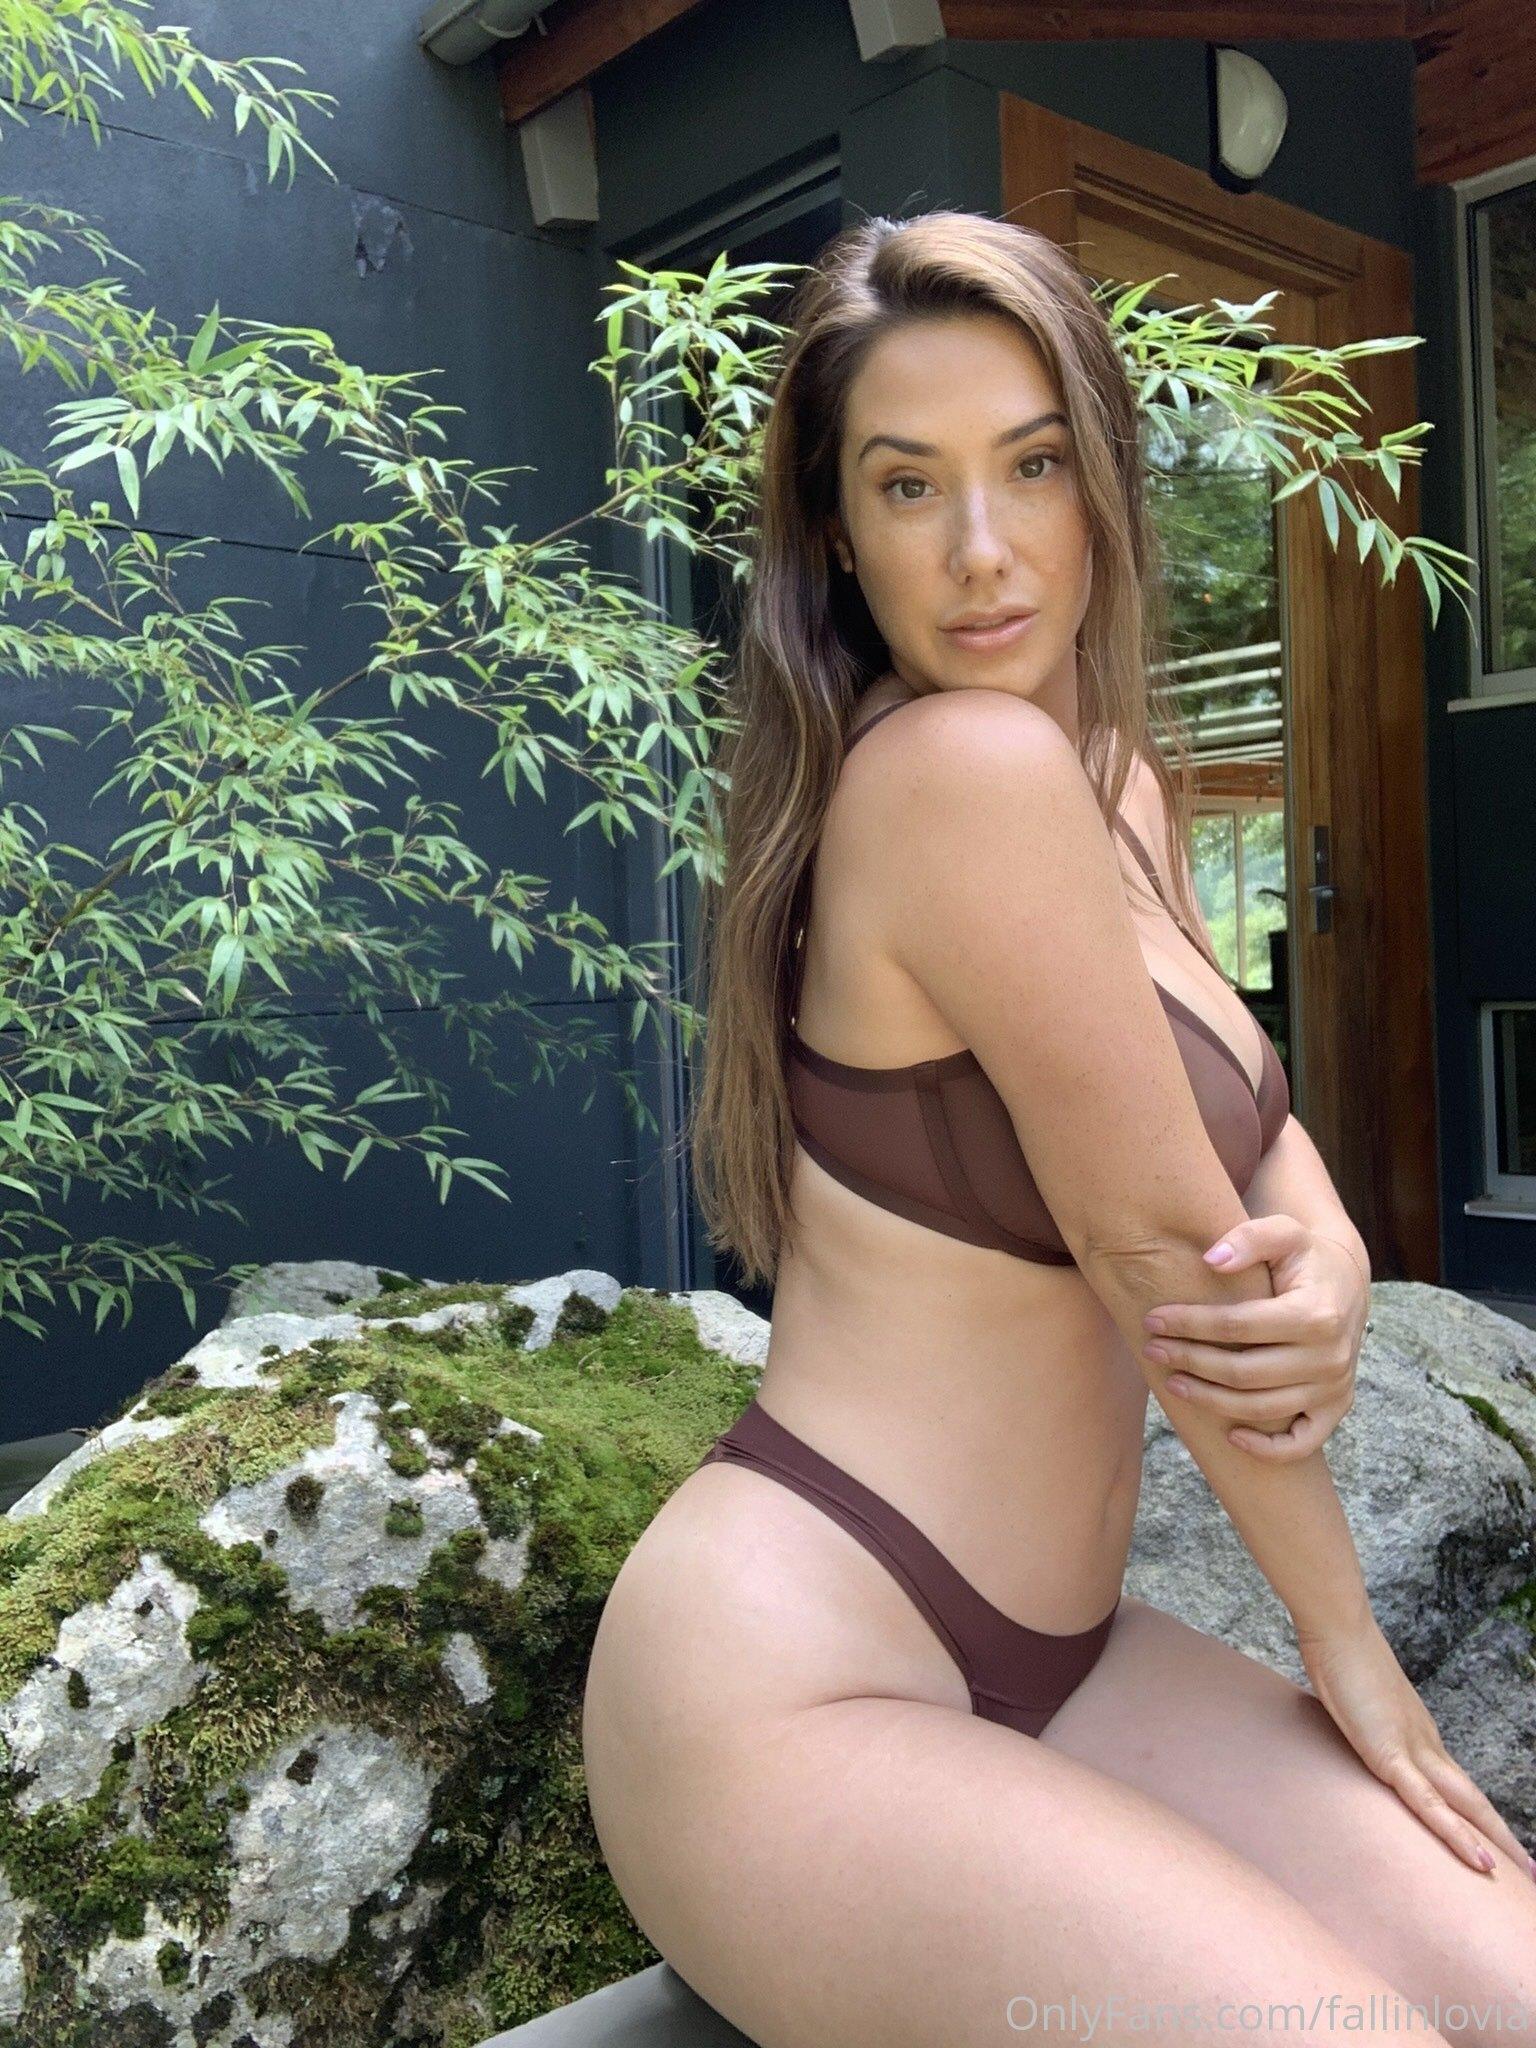 Eva Lovia, Fallinlovia, Onlyfans 0251